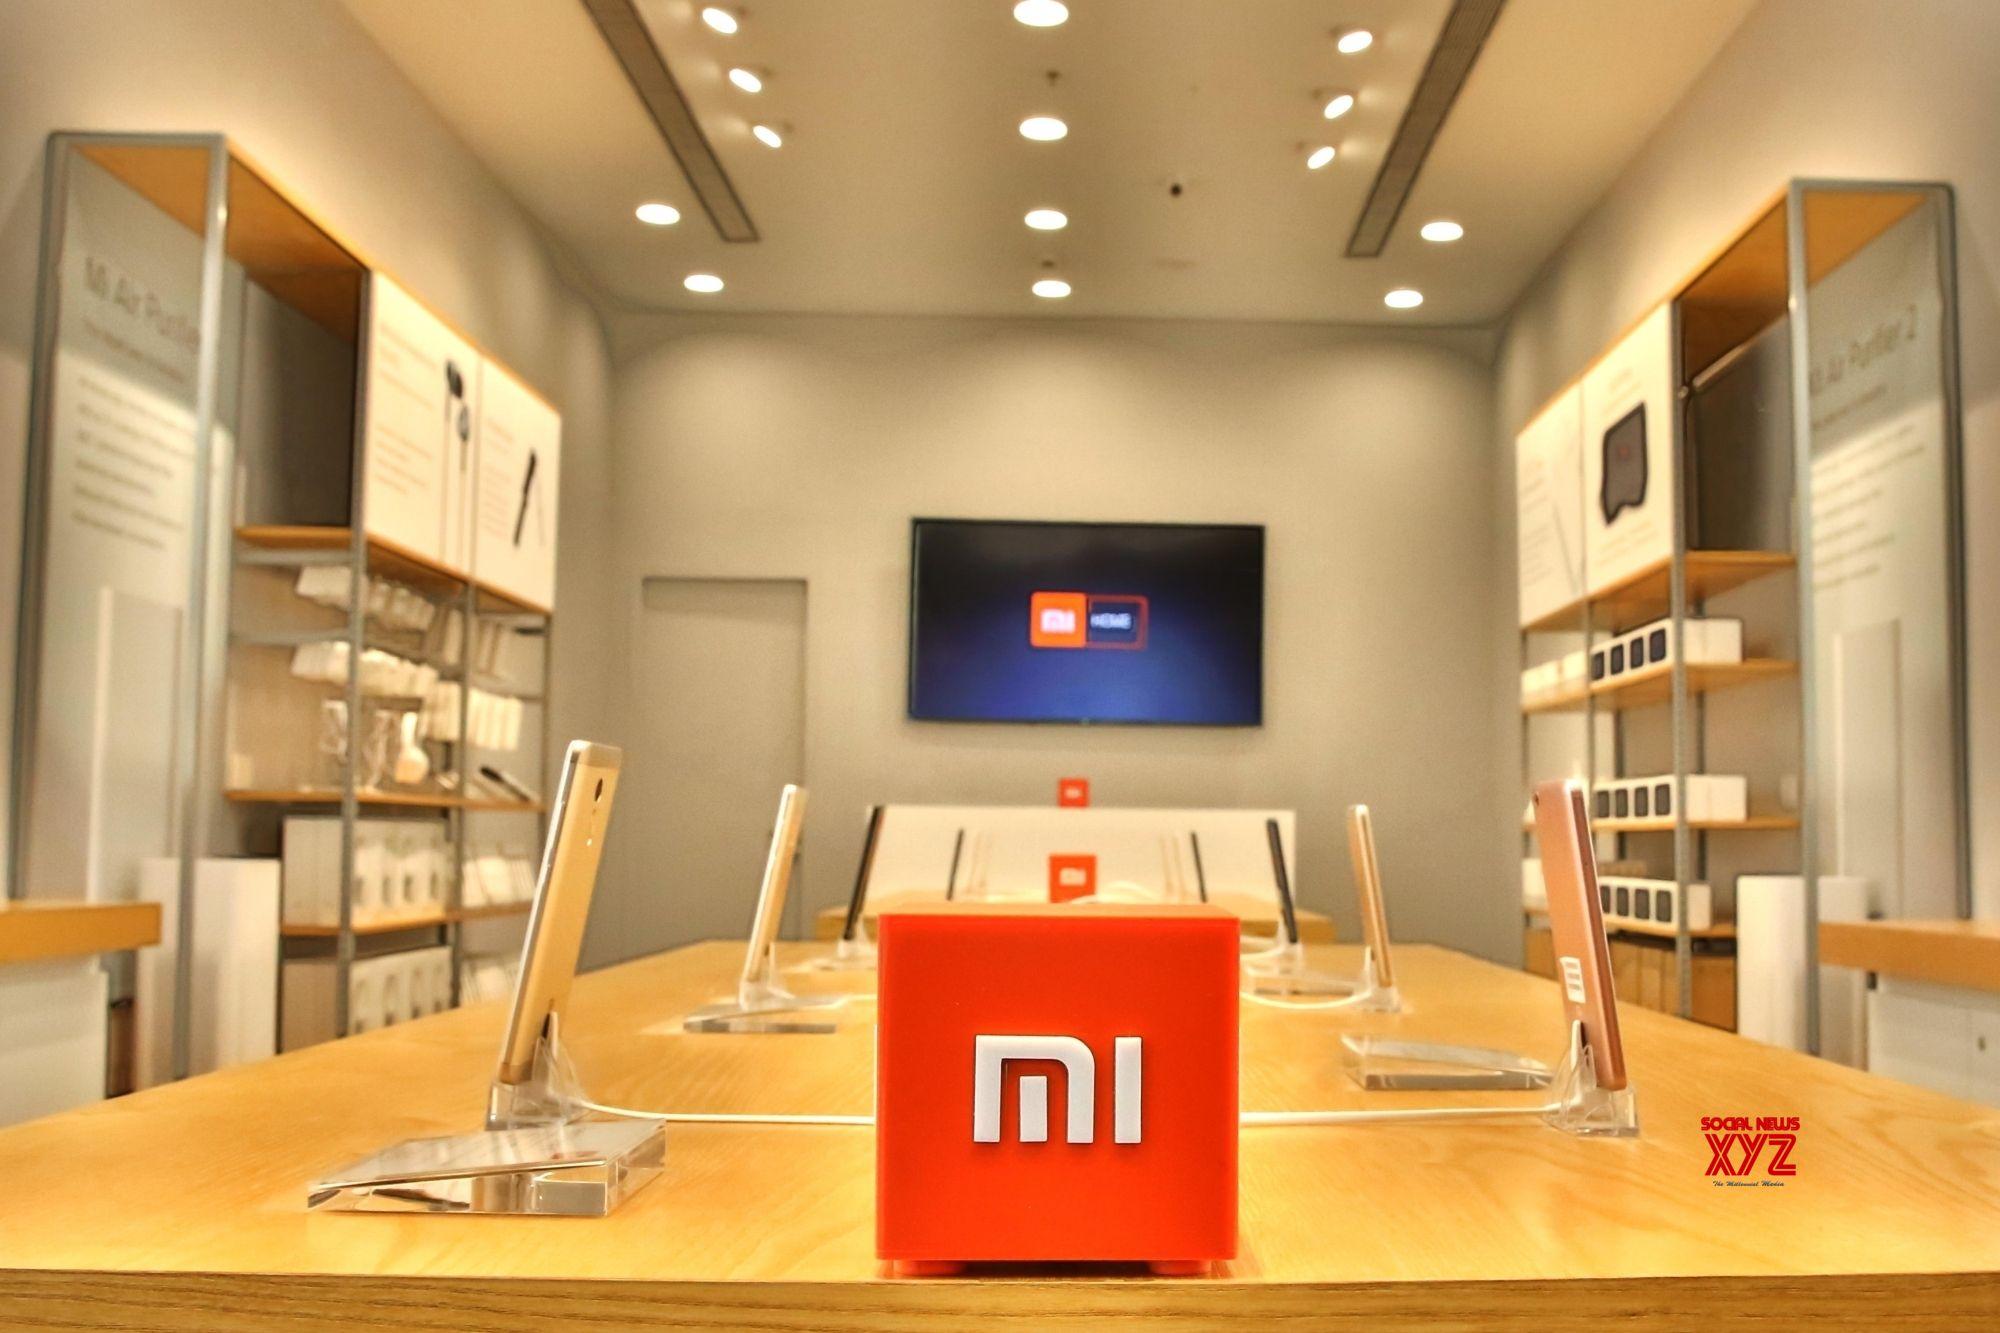 Mi LED TVs cross 2 mn sales mark in 14 months: Xiaomi